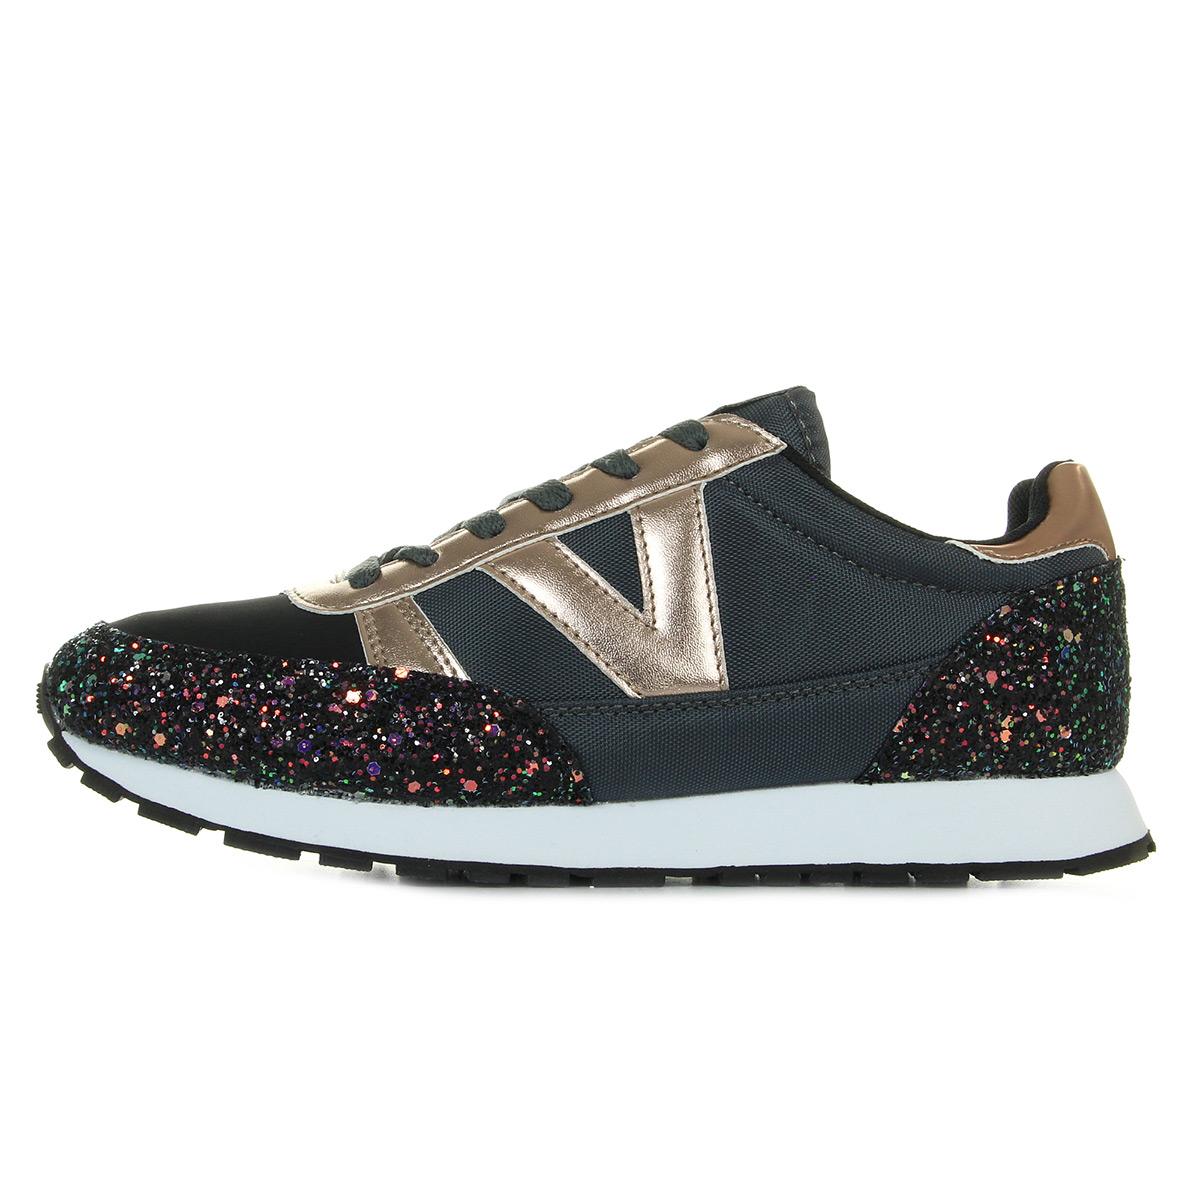 Victoria 141103 Negro 141103NEGRO, Baskets mode femme